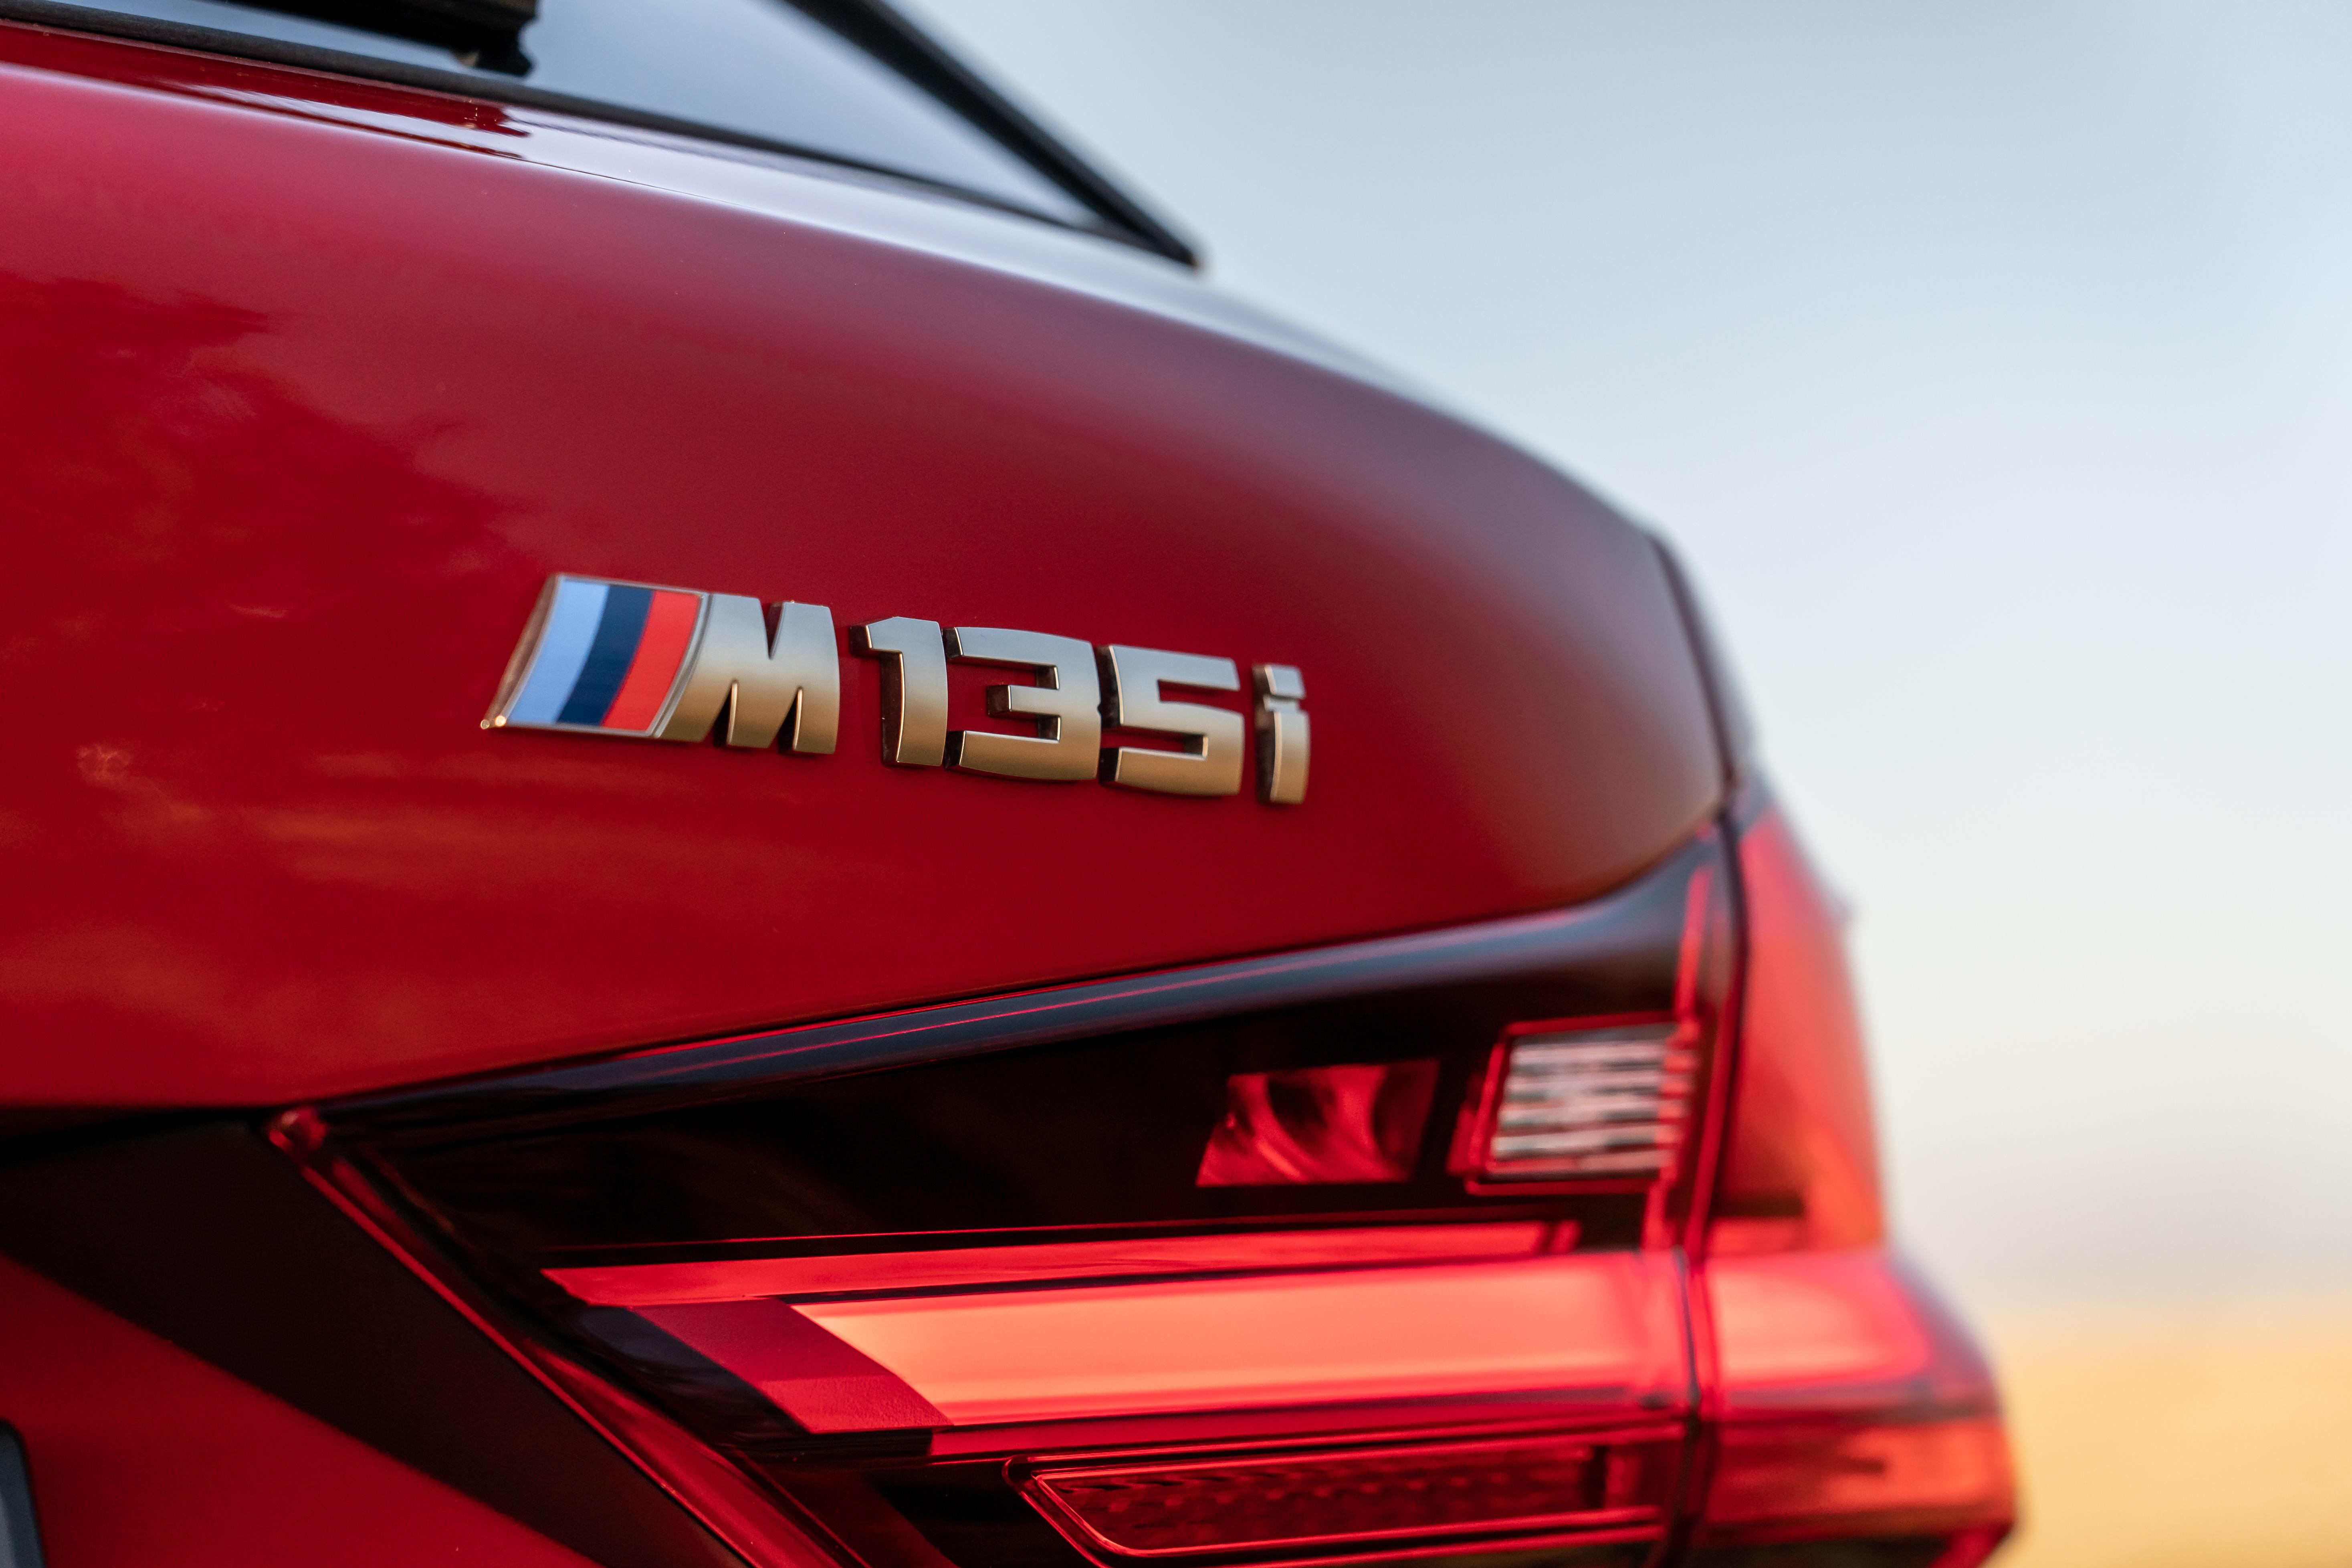 BMW M135i detail